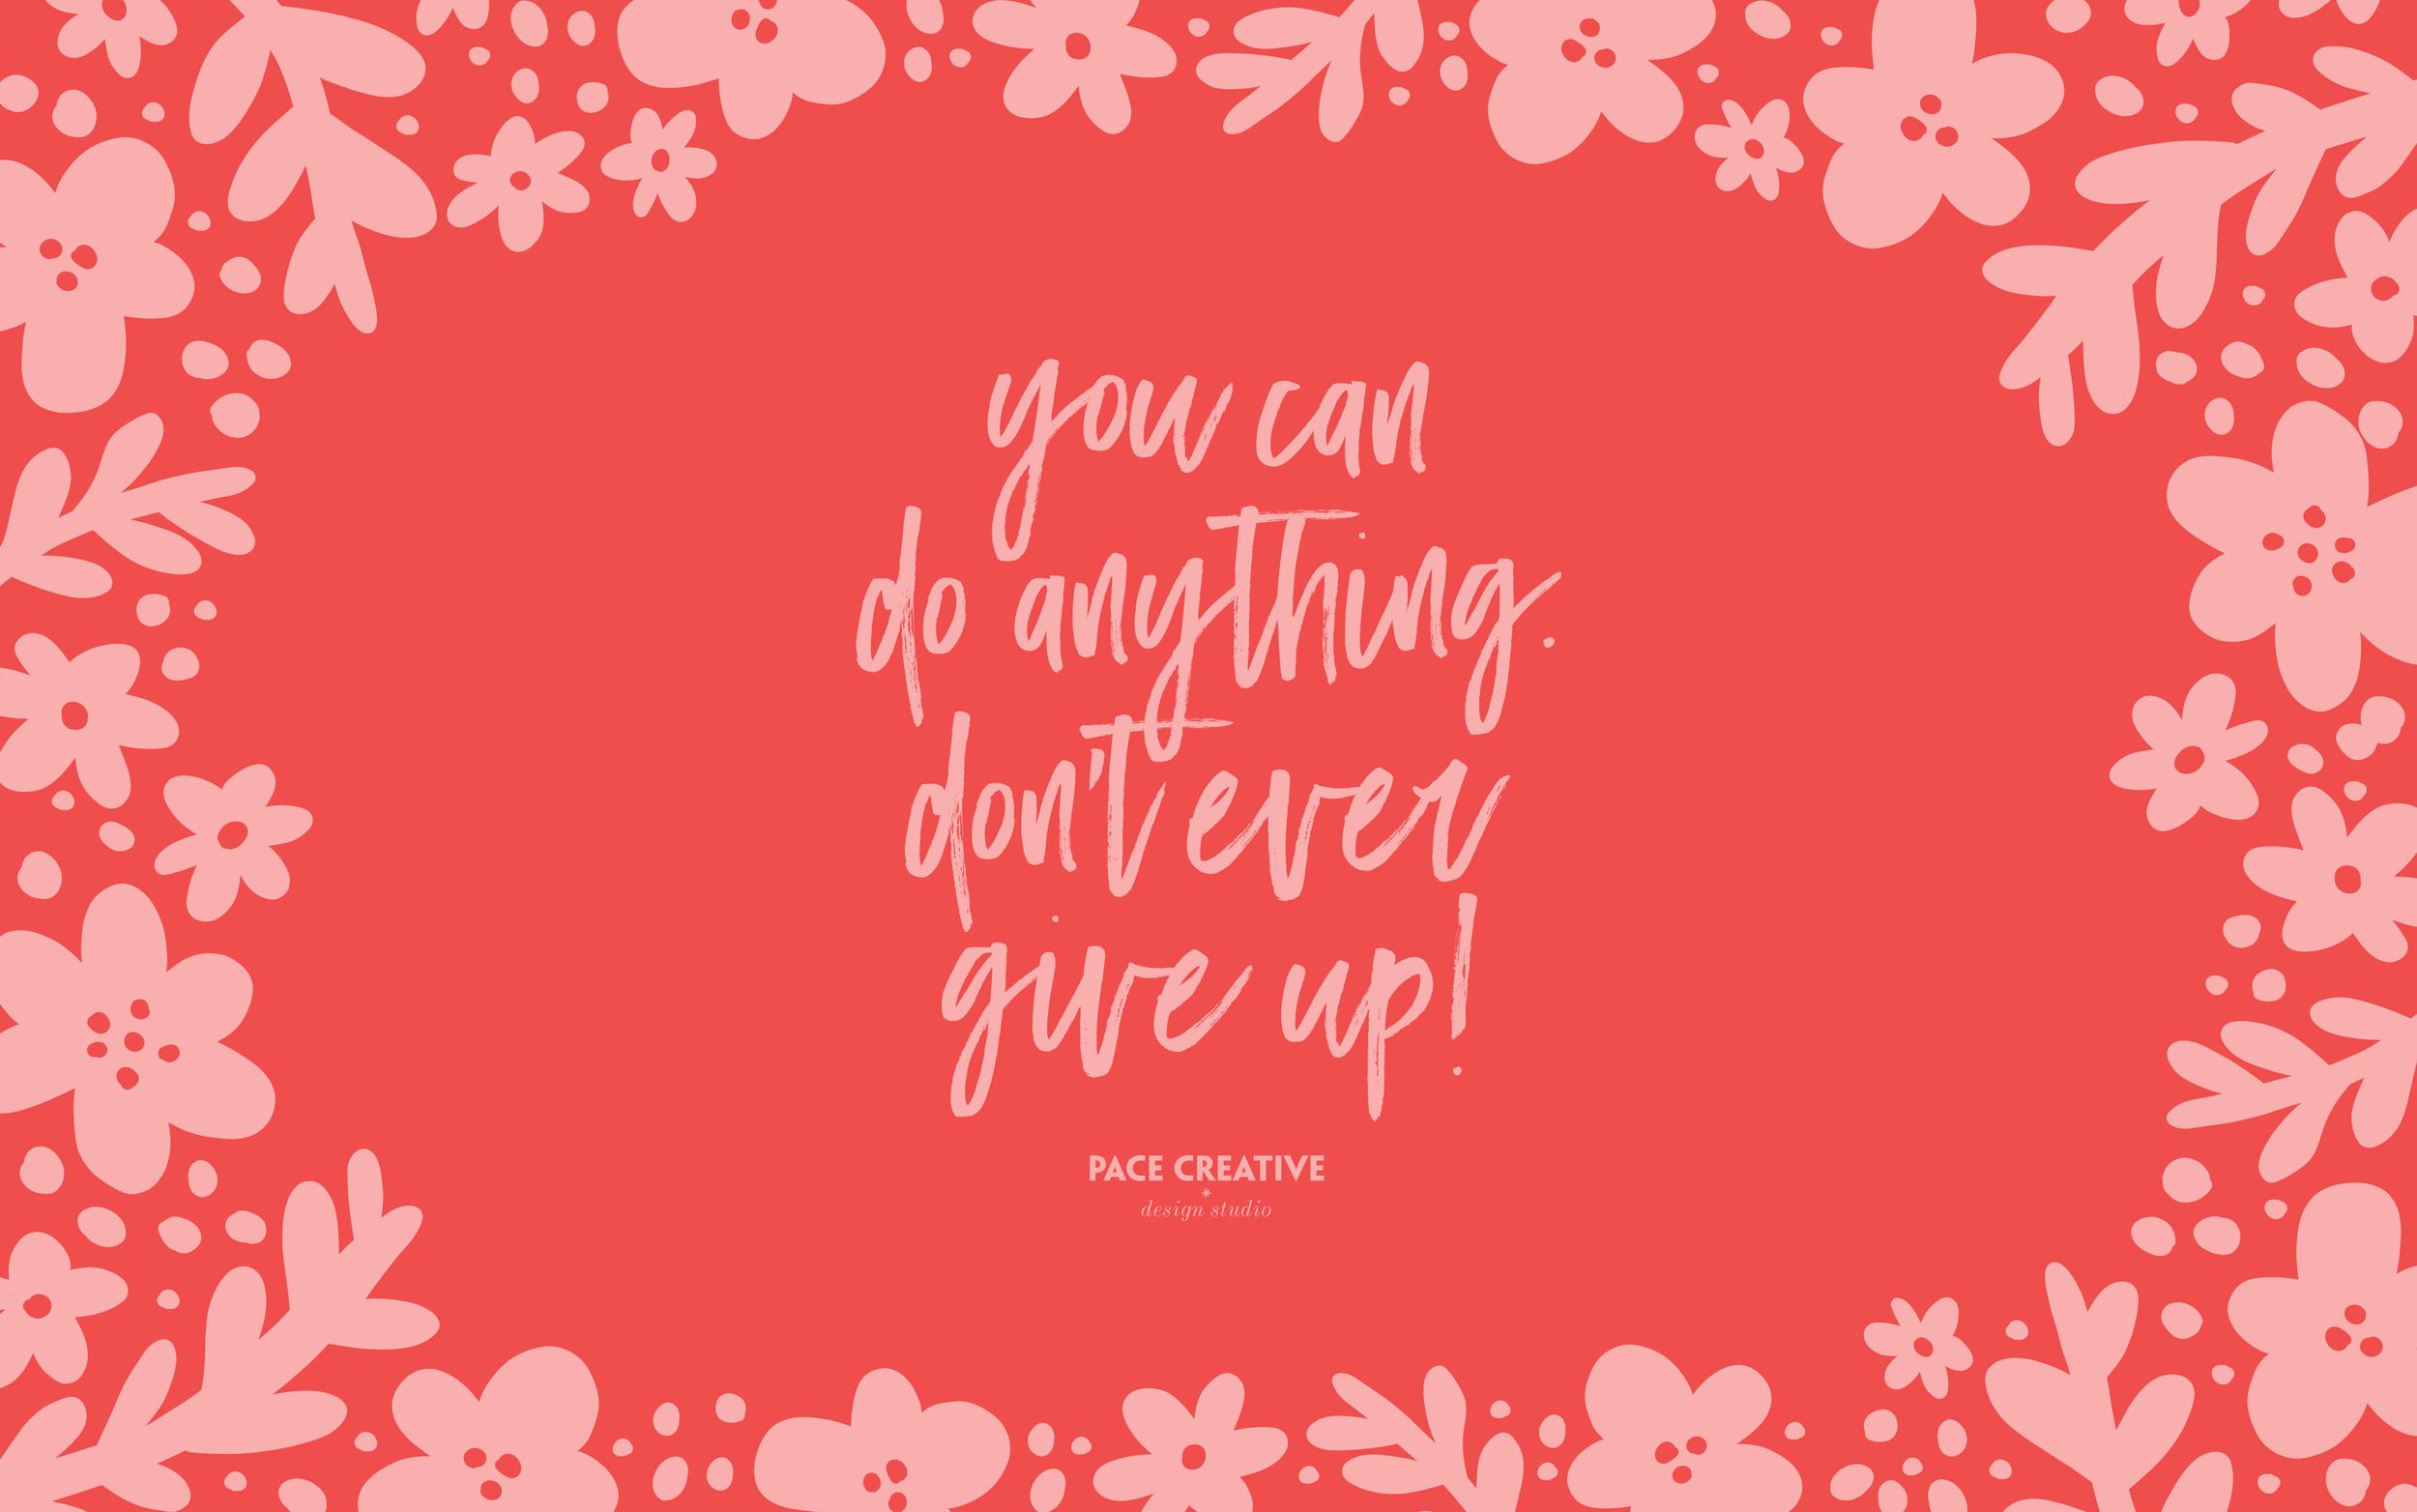 You Can Do It | Free Desktop Wallpaper design by Pace Creative Design Studio